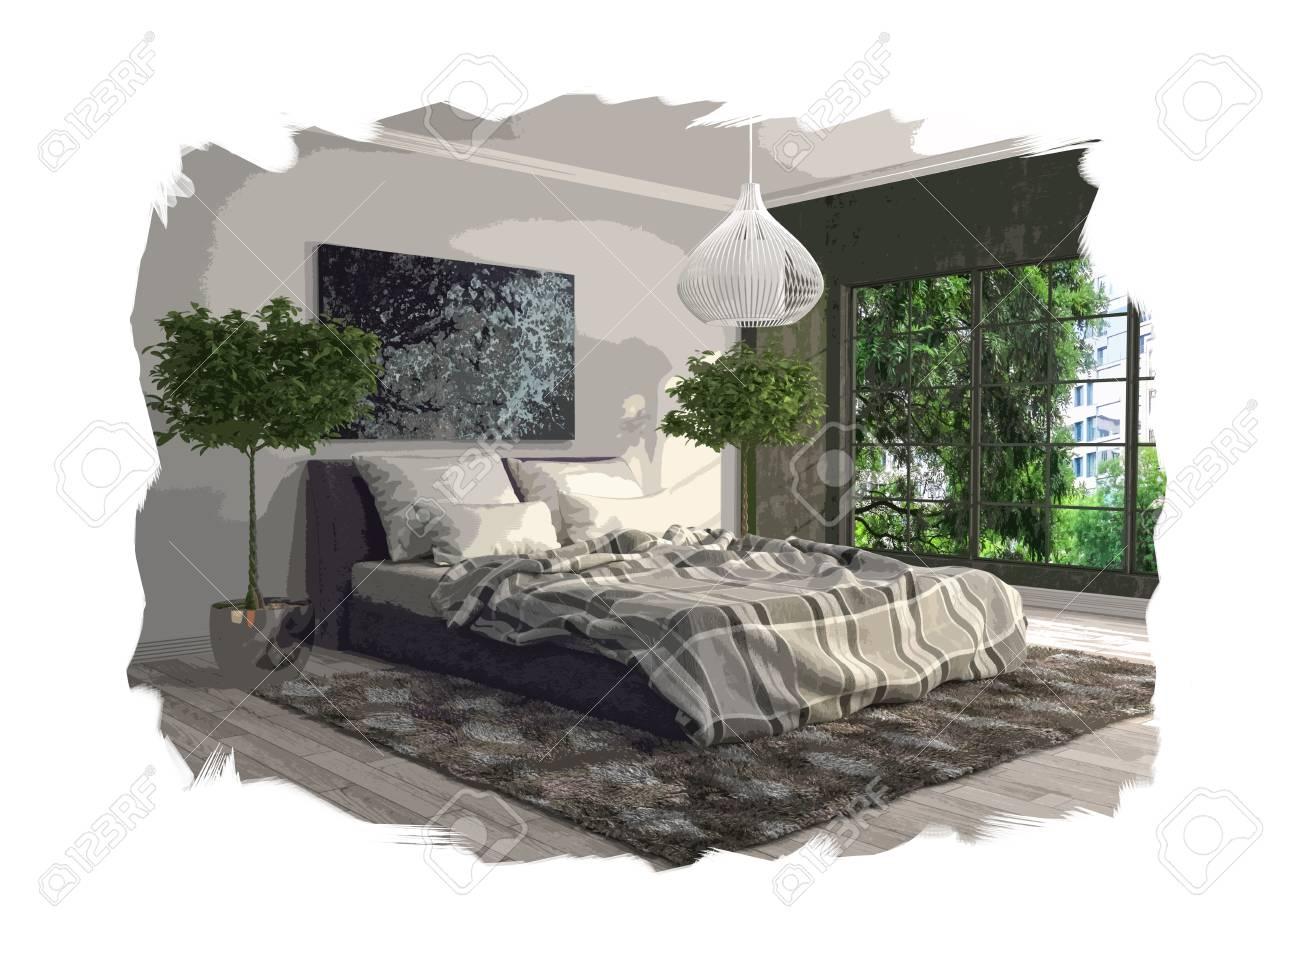 interior sketch design of bedroom. 3D